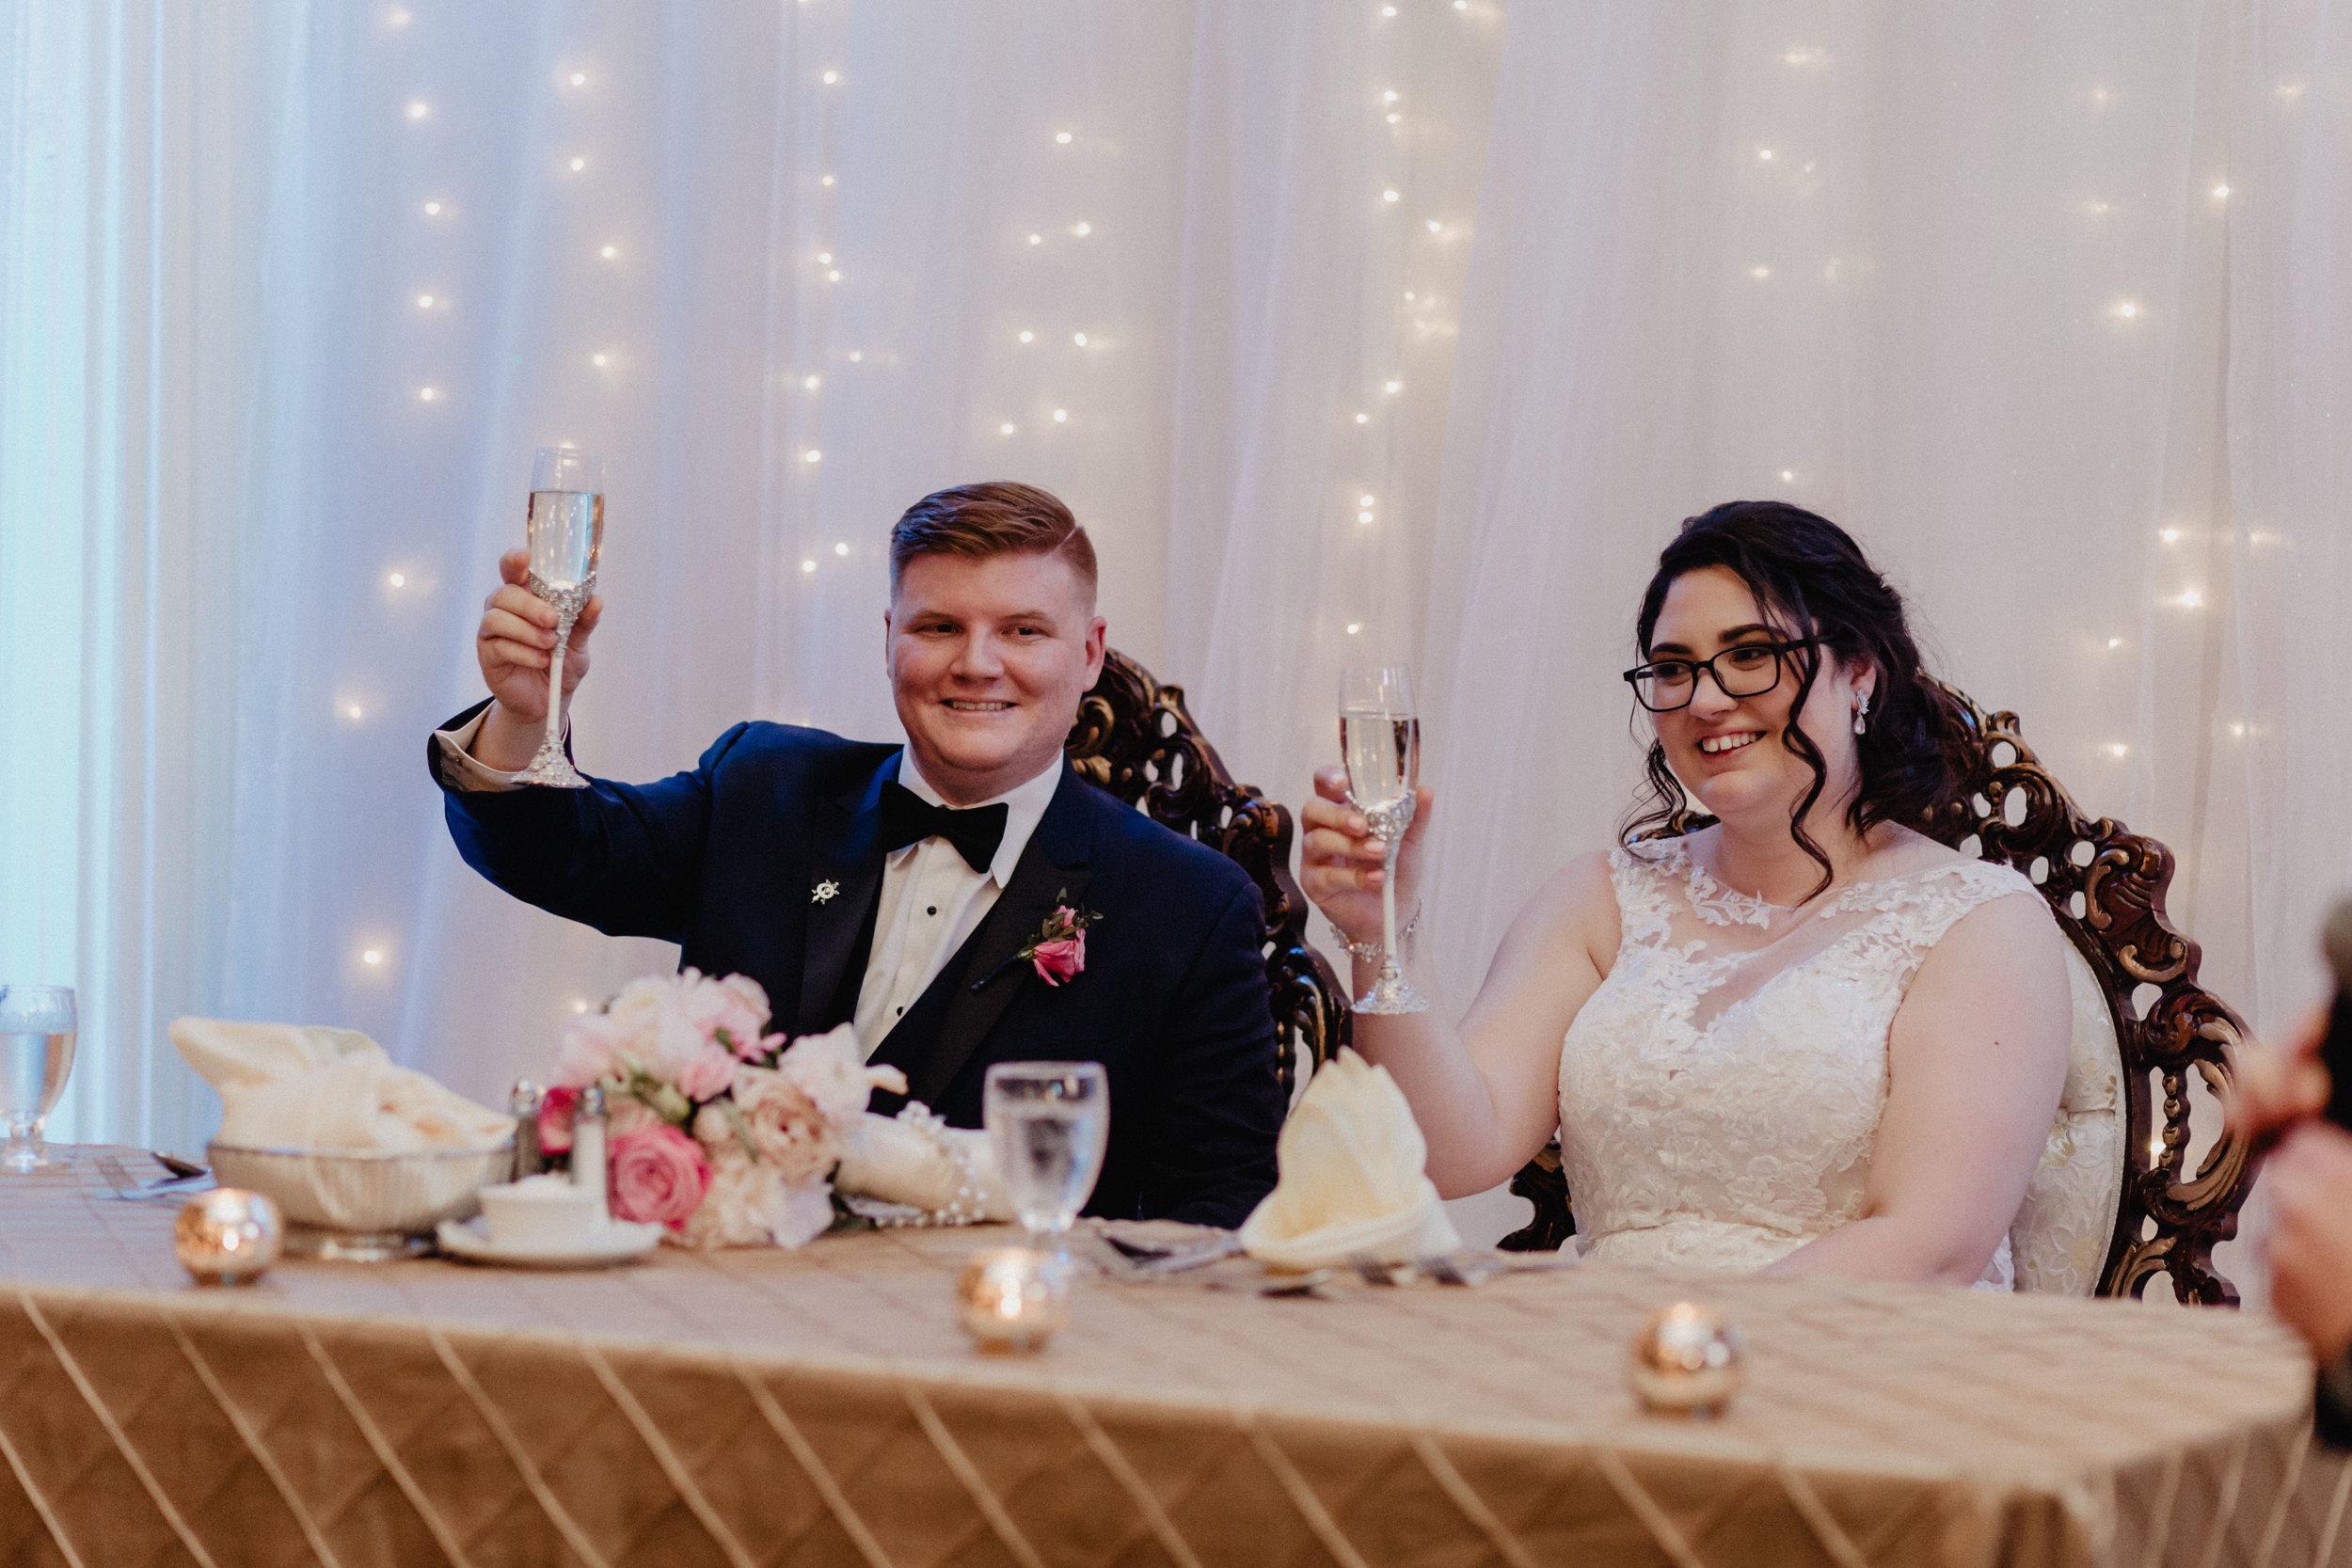 albany-new-york-wedding-61.jpg